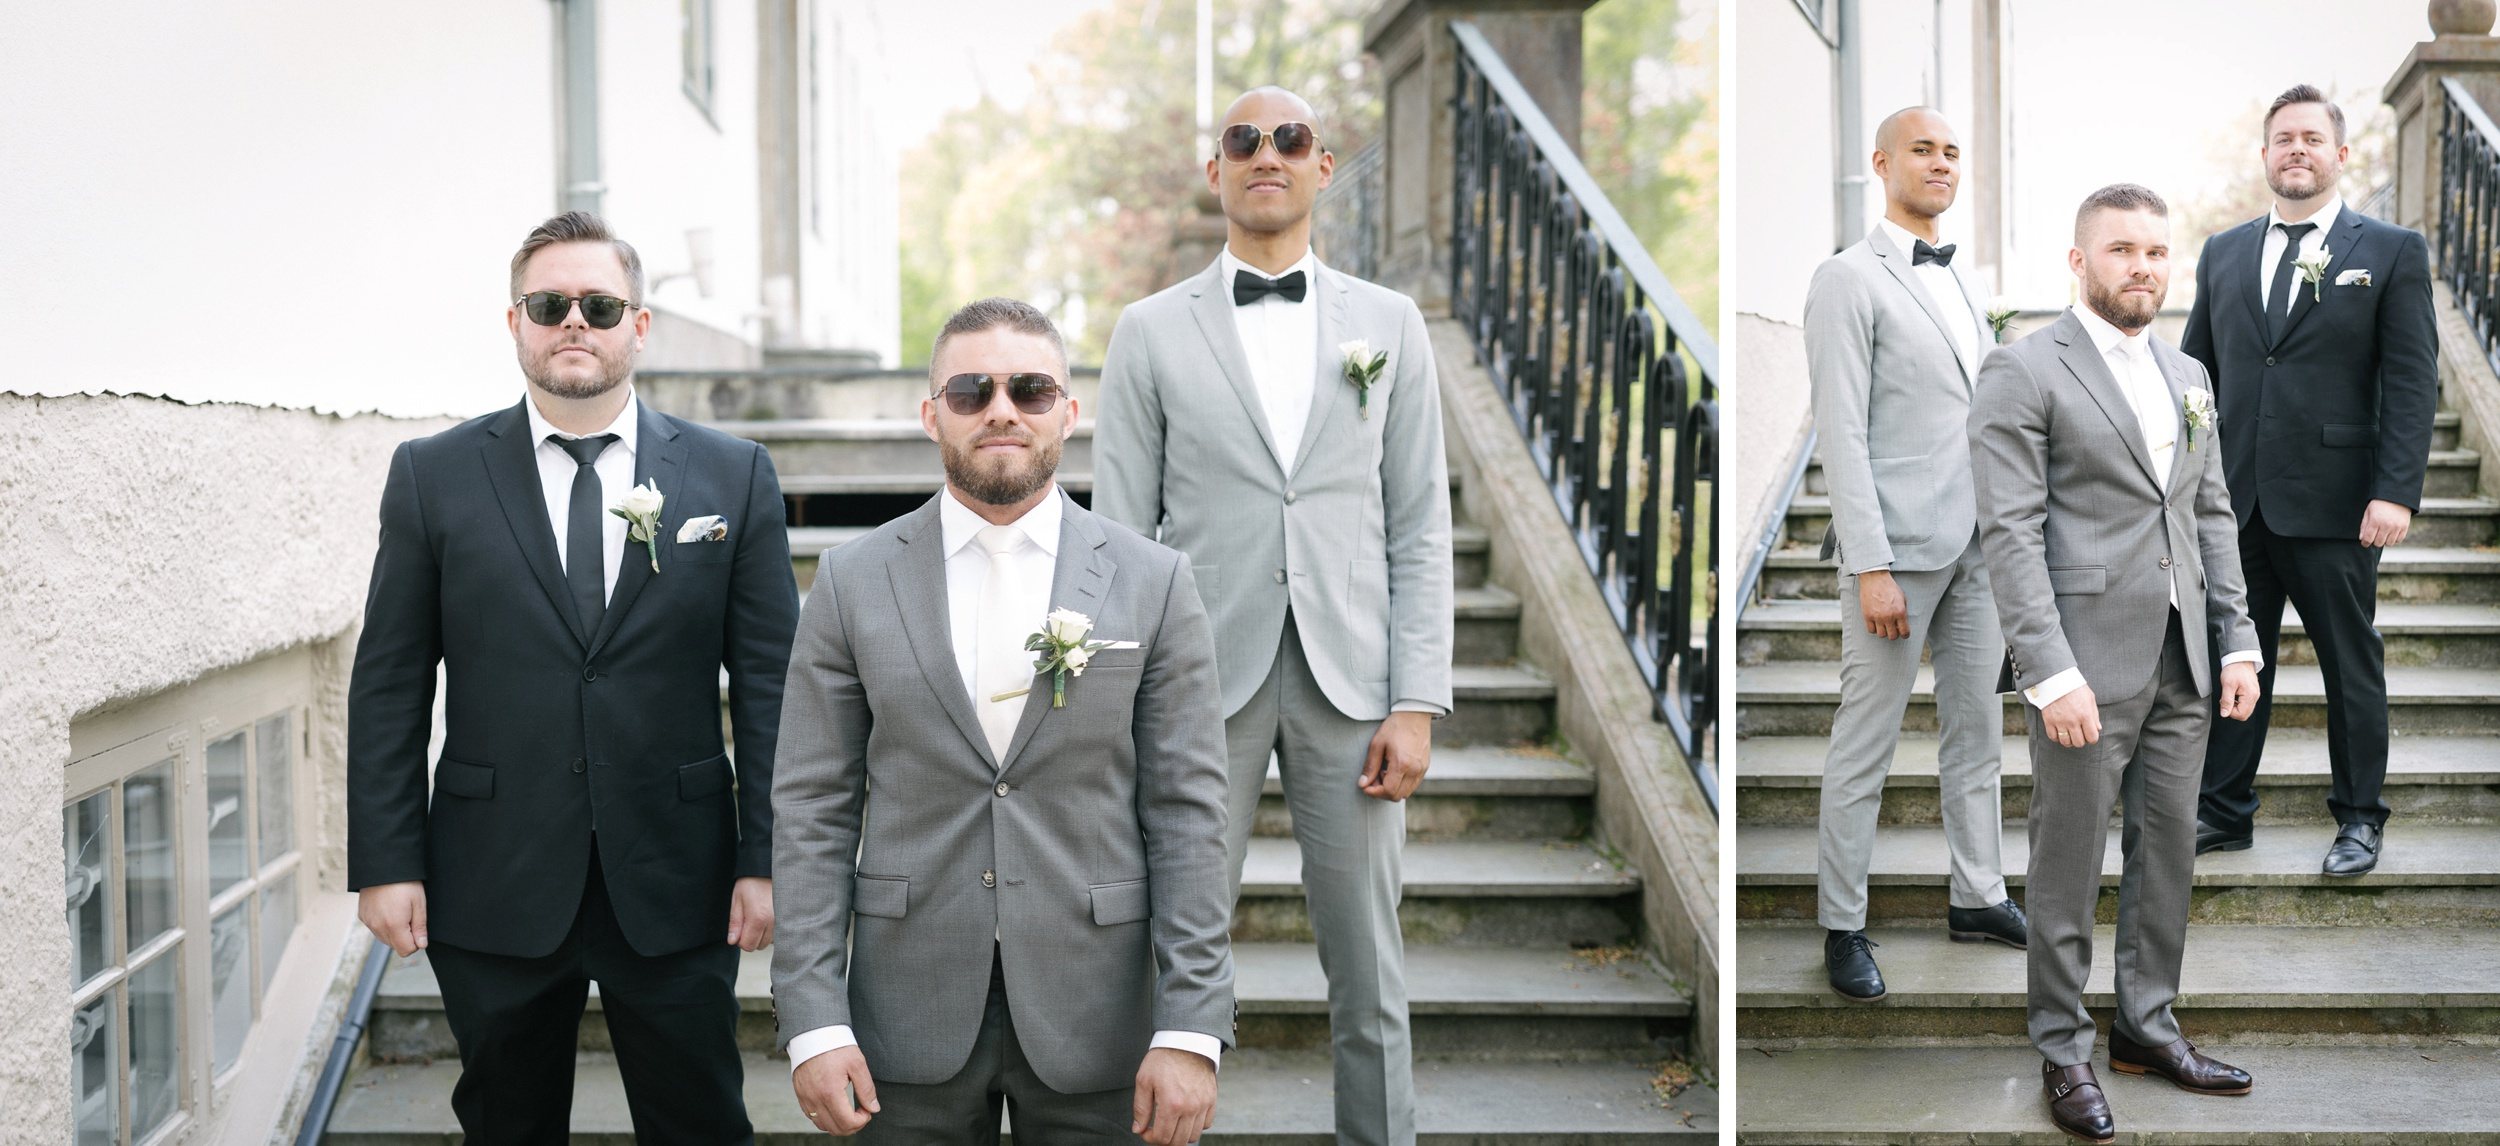 bryllup-bryllupsfotografering-bryllupsfotograf-sarpsborg-20170520-_H2A1288Camilla-og-ruben_WEB.jpg